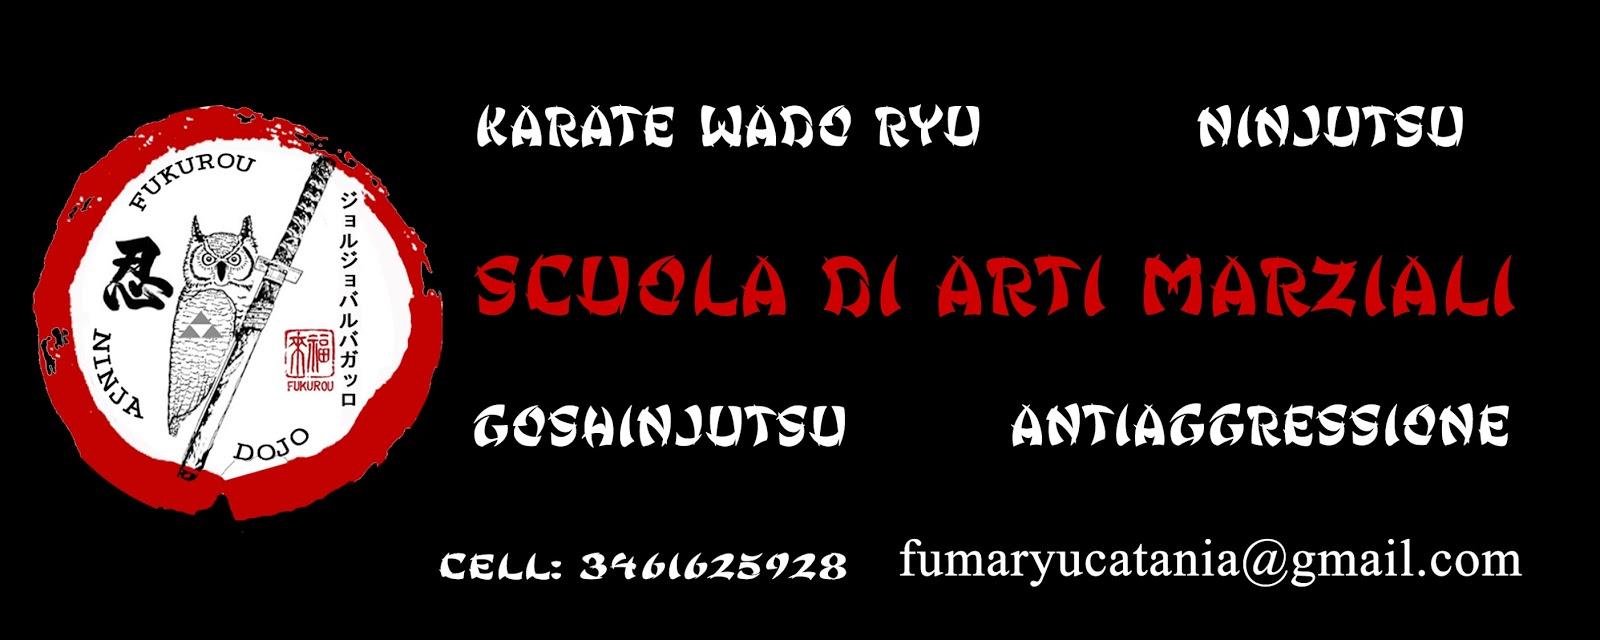 fumaryucatania.wix.com/ninjutsu-catania